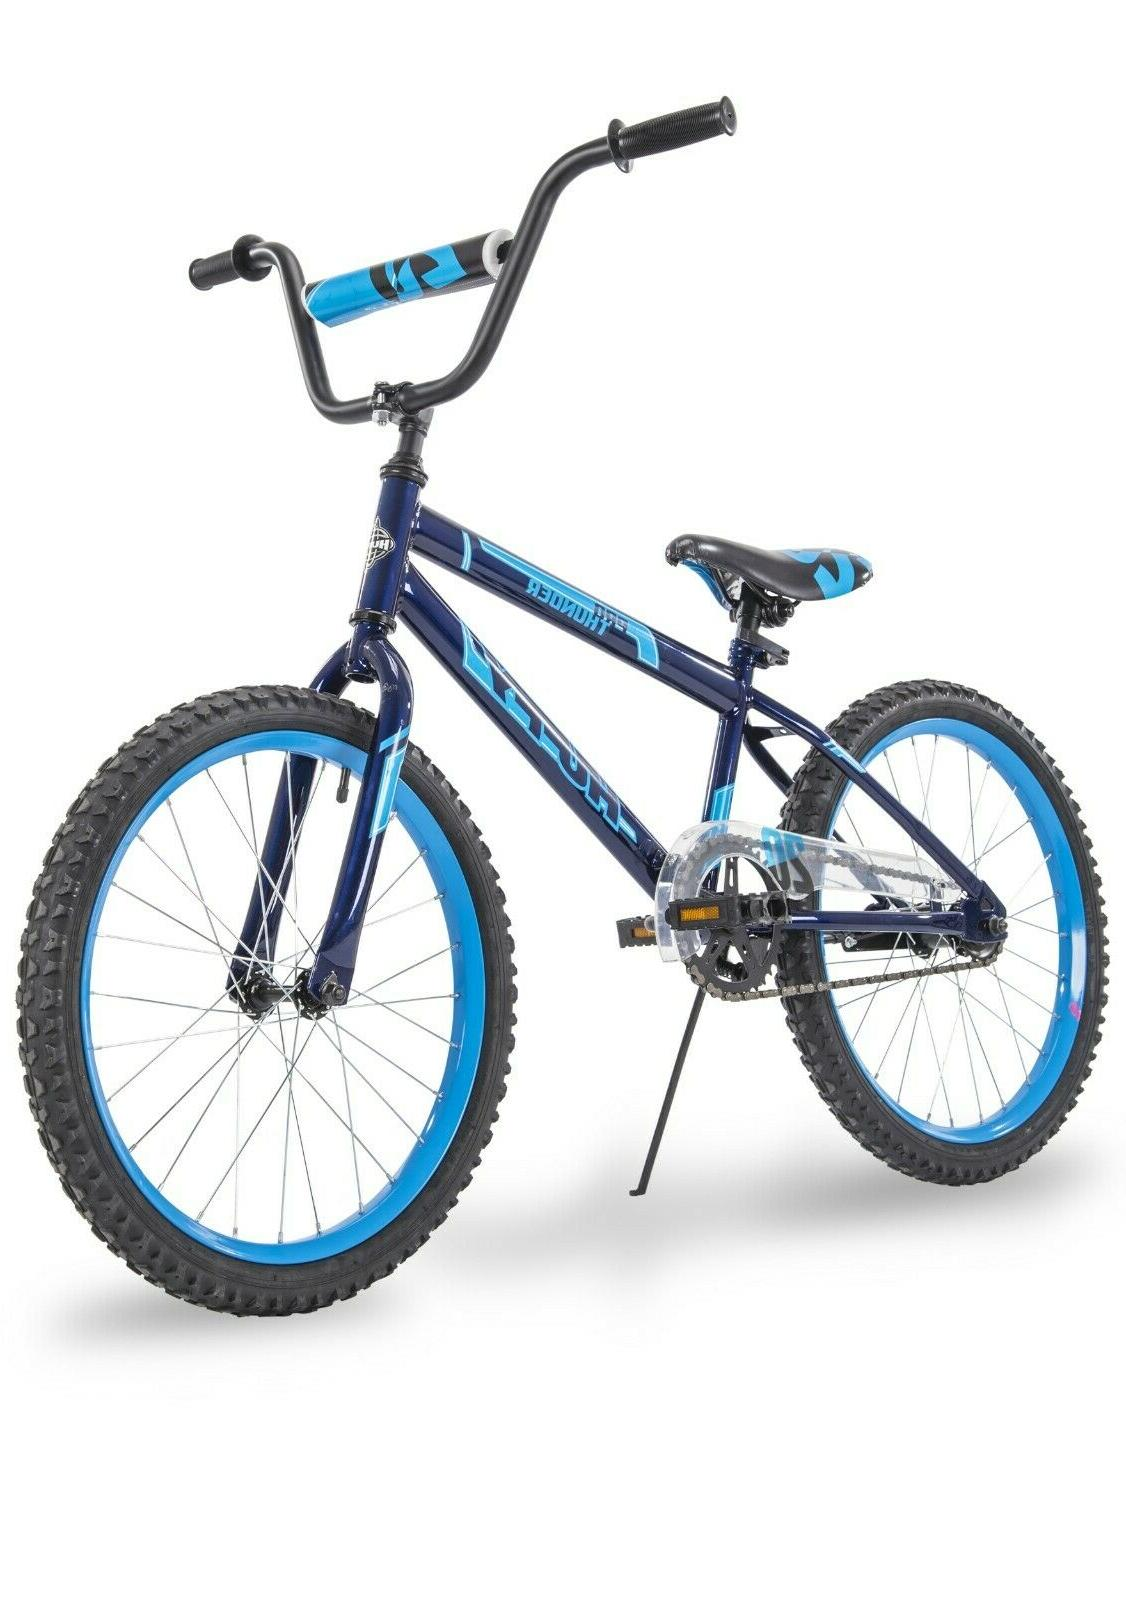 Huffy Bike 20 inch Pro Thunder, NEW